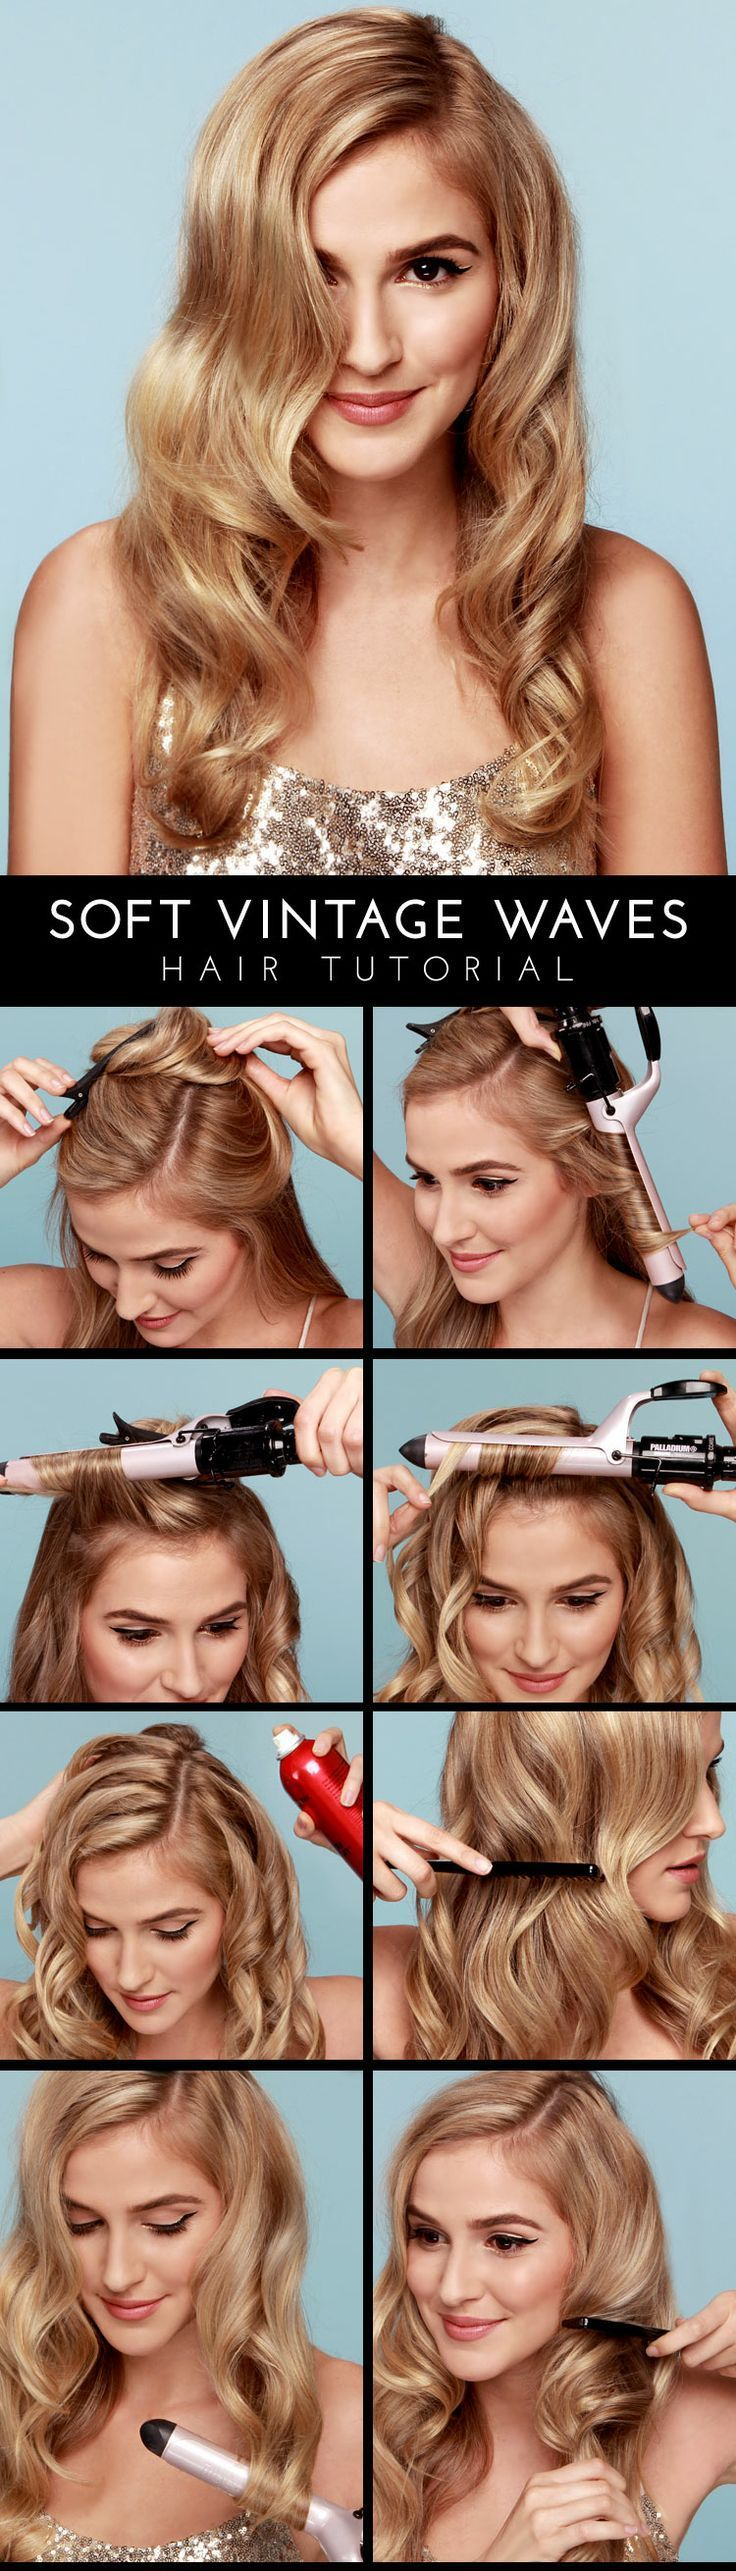 Remarkable 1000 Ideas About Vintage Waves Tutorial On Pinterest Vintage Short Hairstyles Gunalazisus